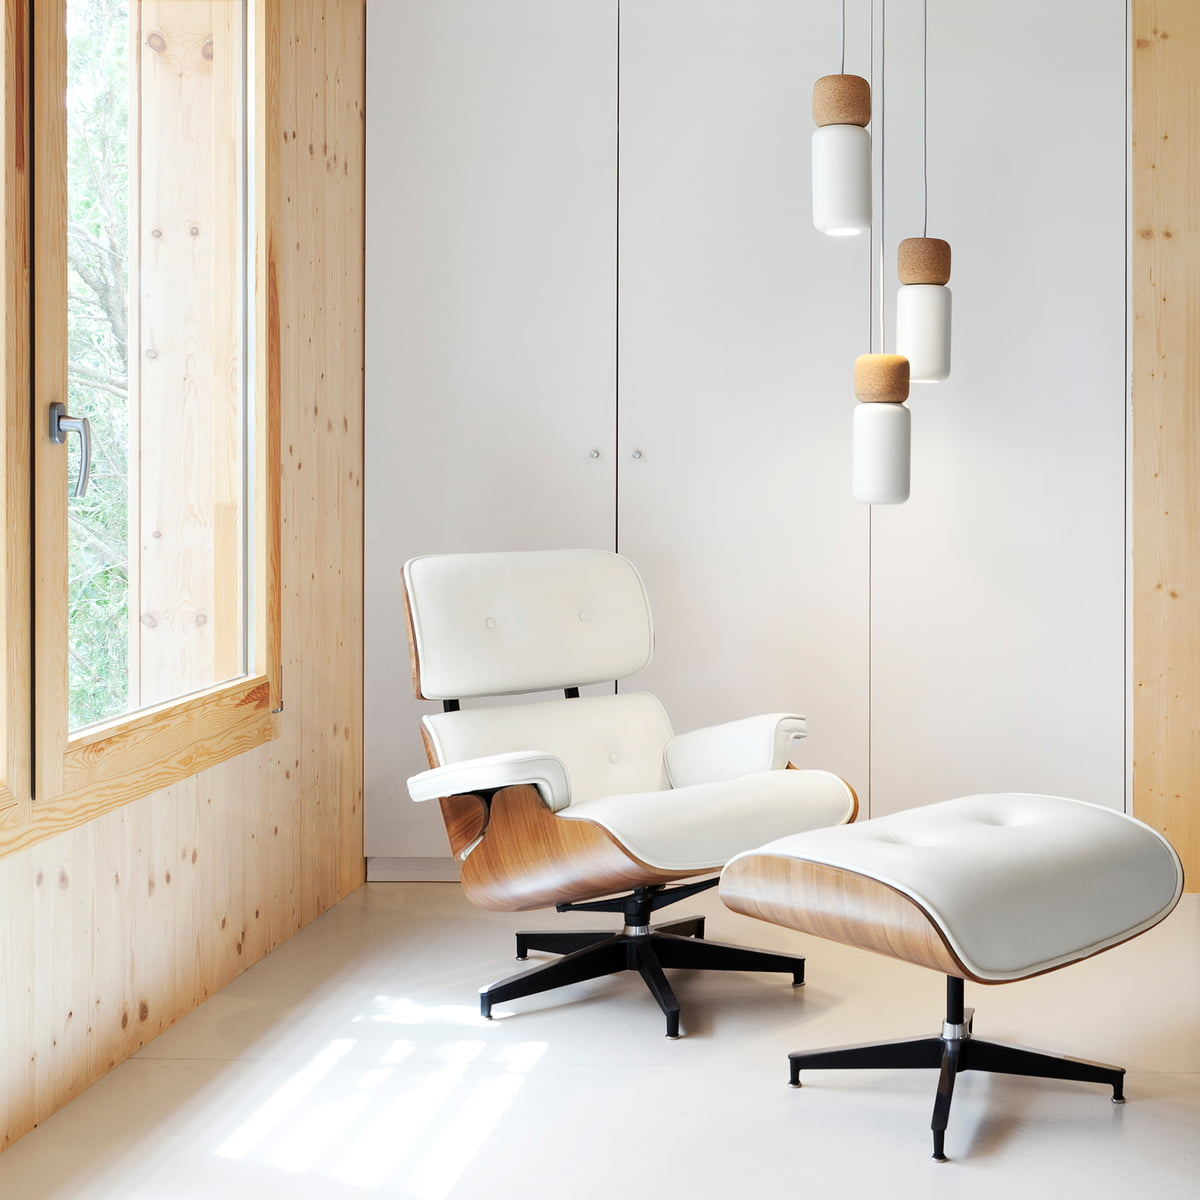 Vitra lounge chair amp ottoman white version von charles amp ray eames - Vitra Lounge Chair Amp Ottoman White Version Von Charles Amp Ray Eames Pila Pendant Lamp Download